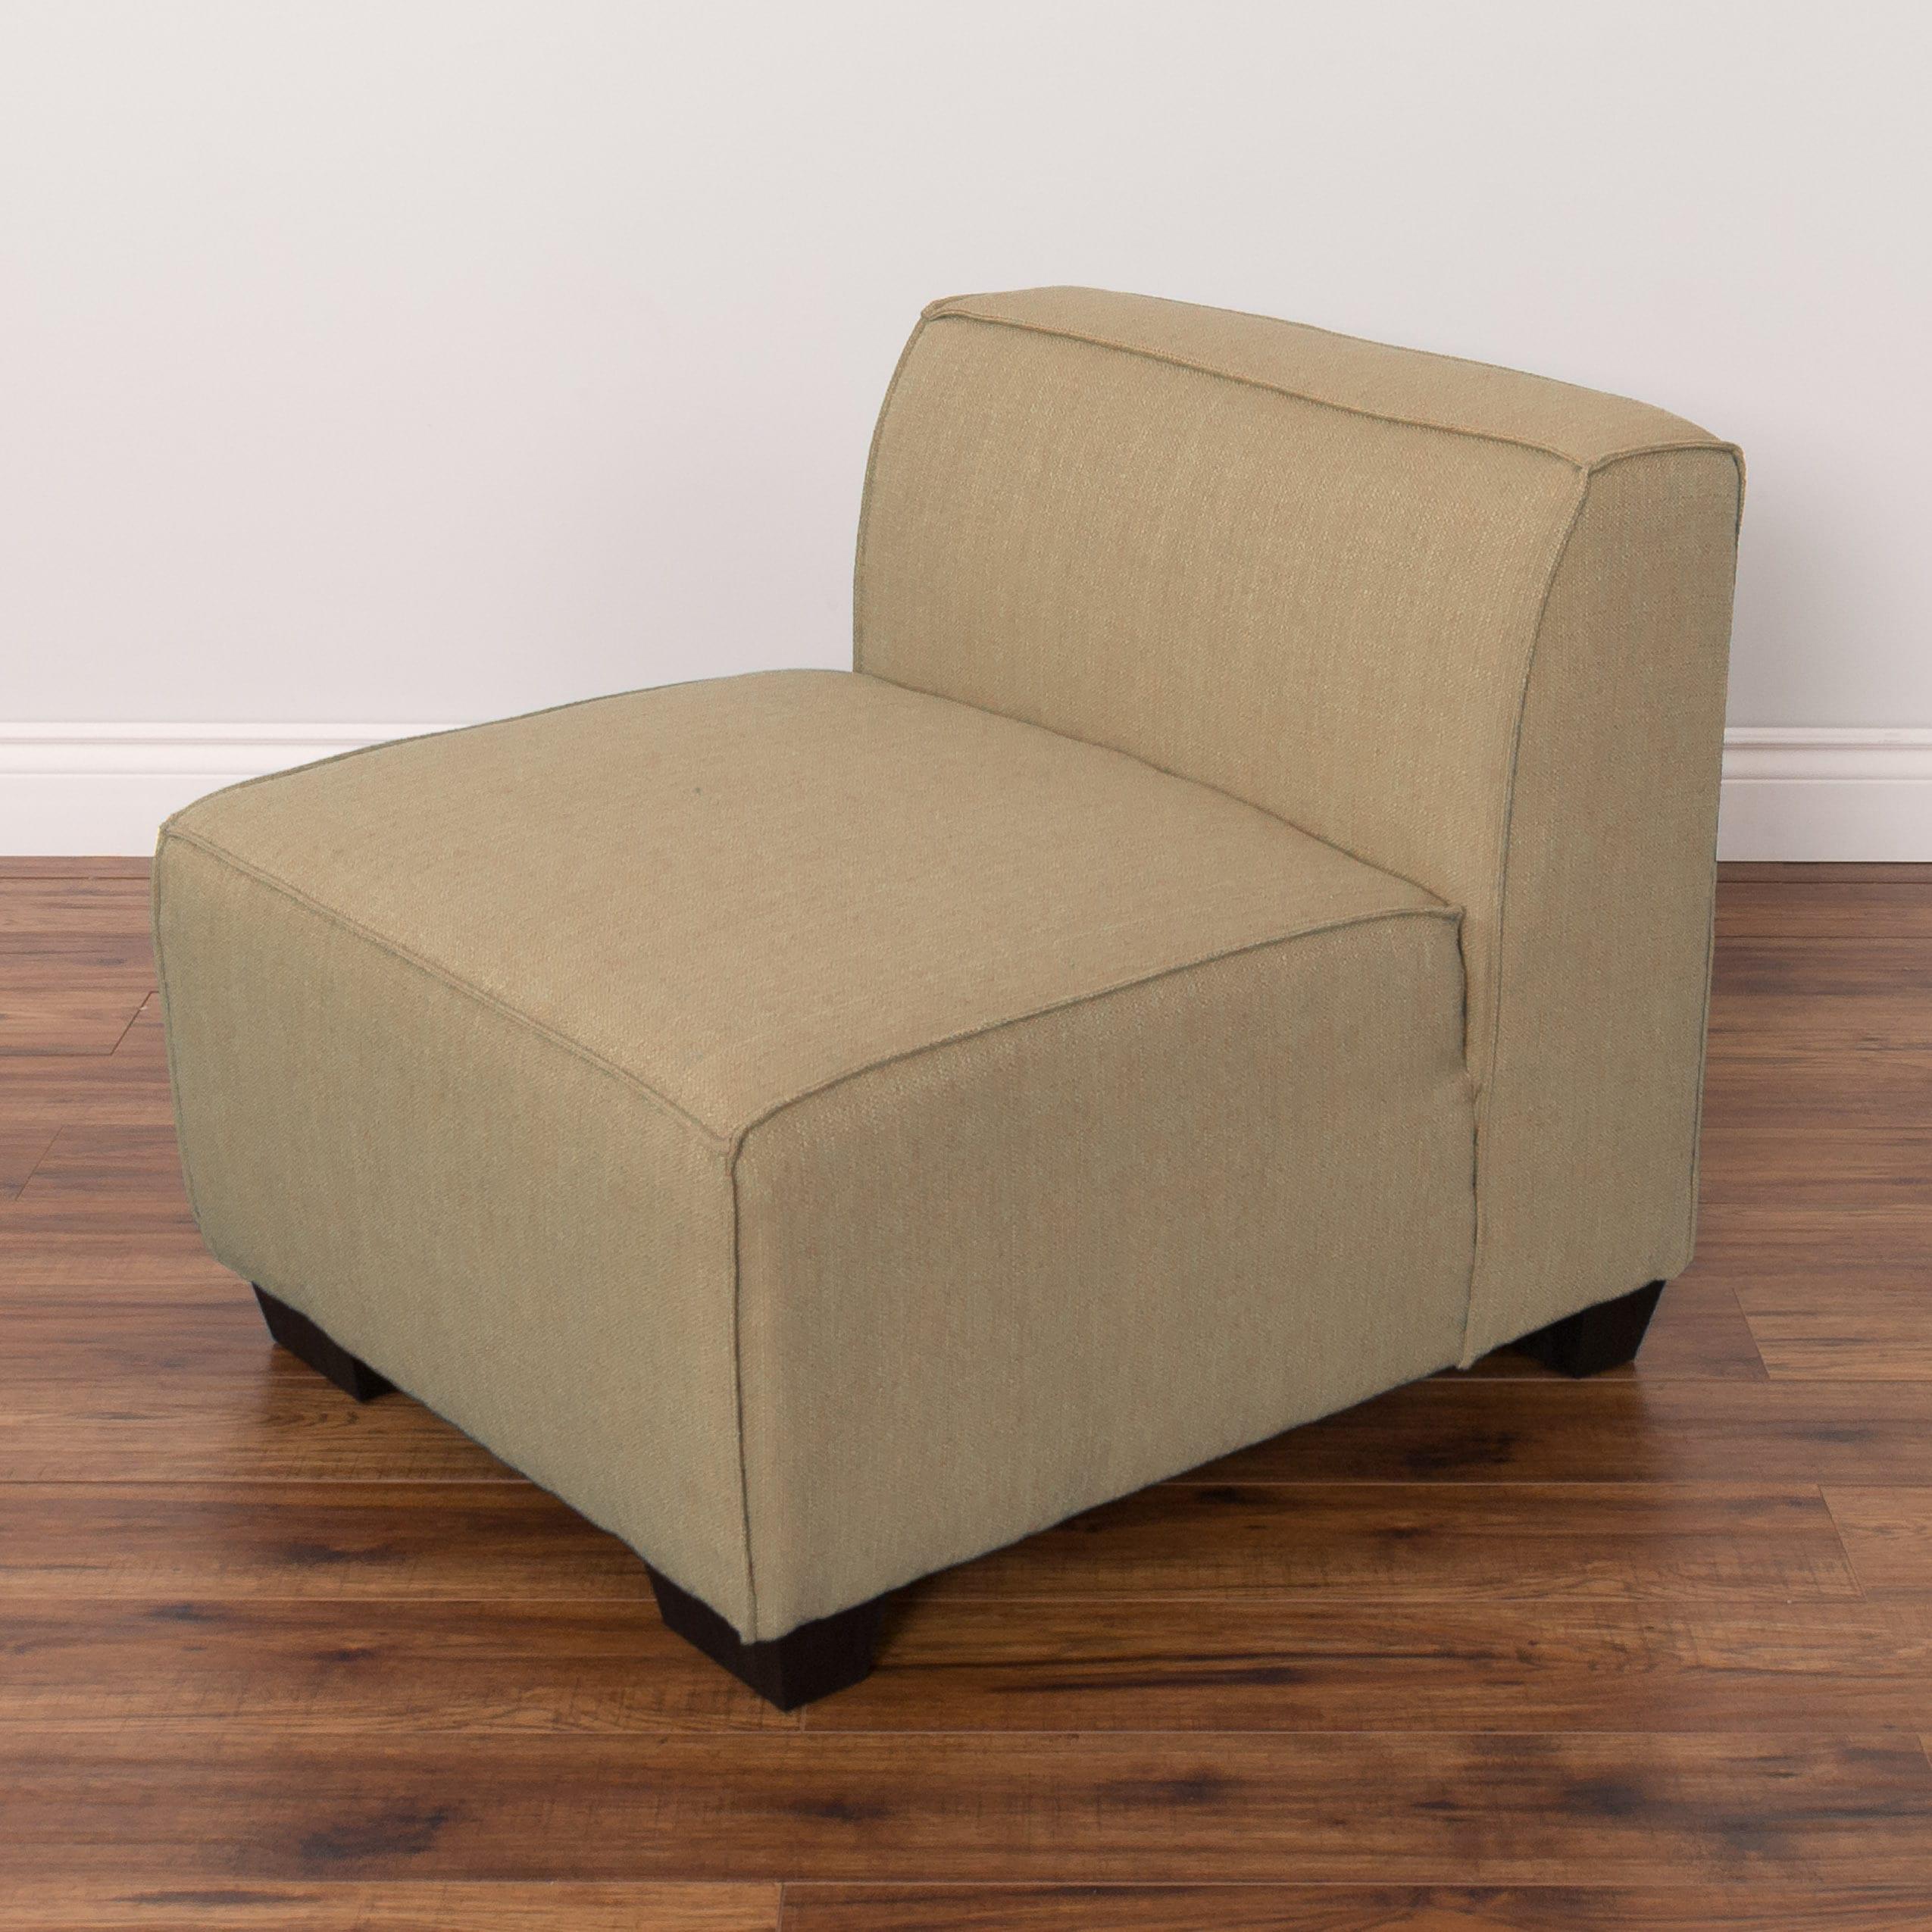 CorLiving Lida Upholstered Solid Wood Middle Sectional Se...